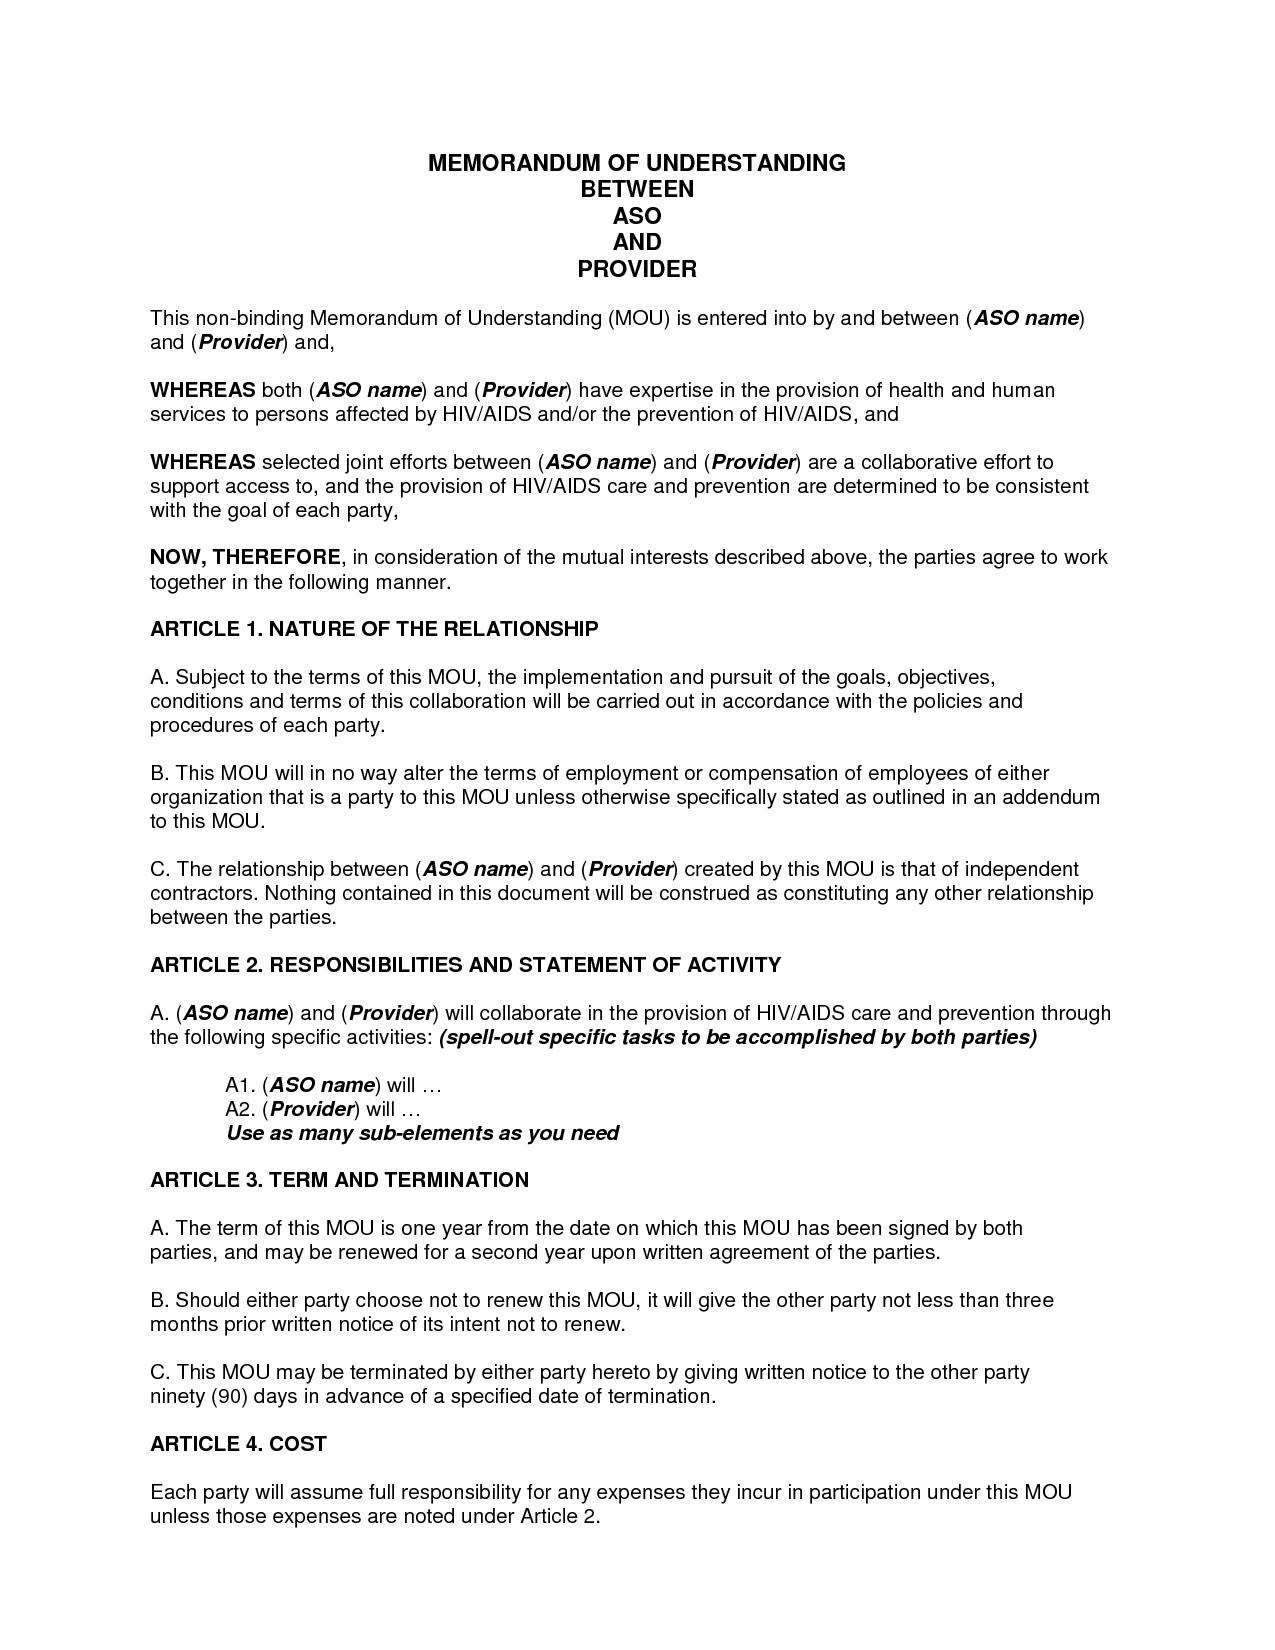 Memorandum Of Understanding Sample Sample Memorandum Of Understanding Business Partnership